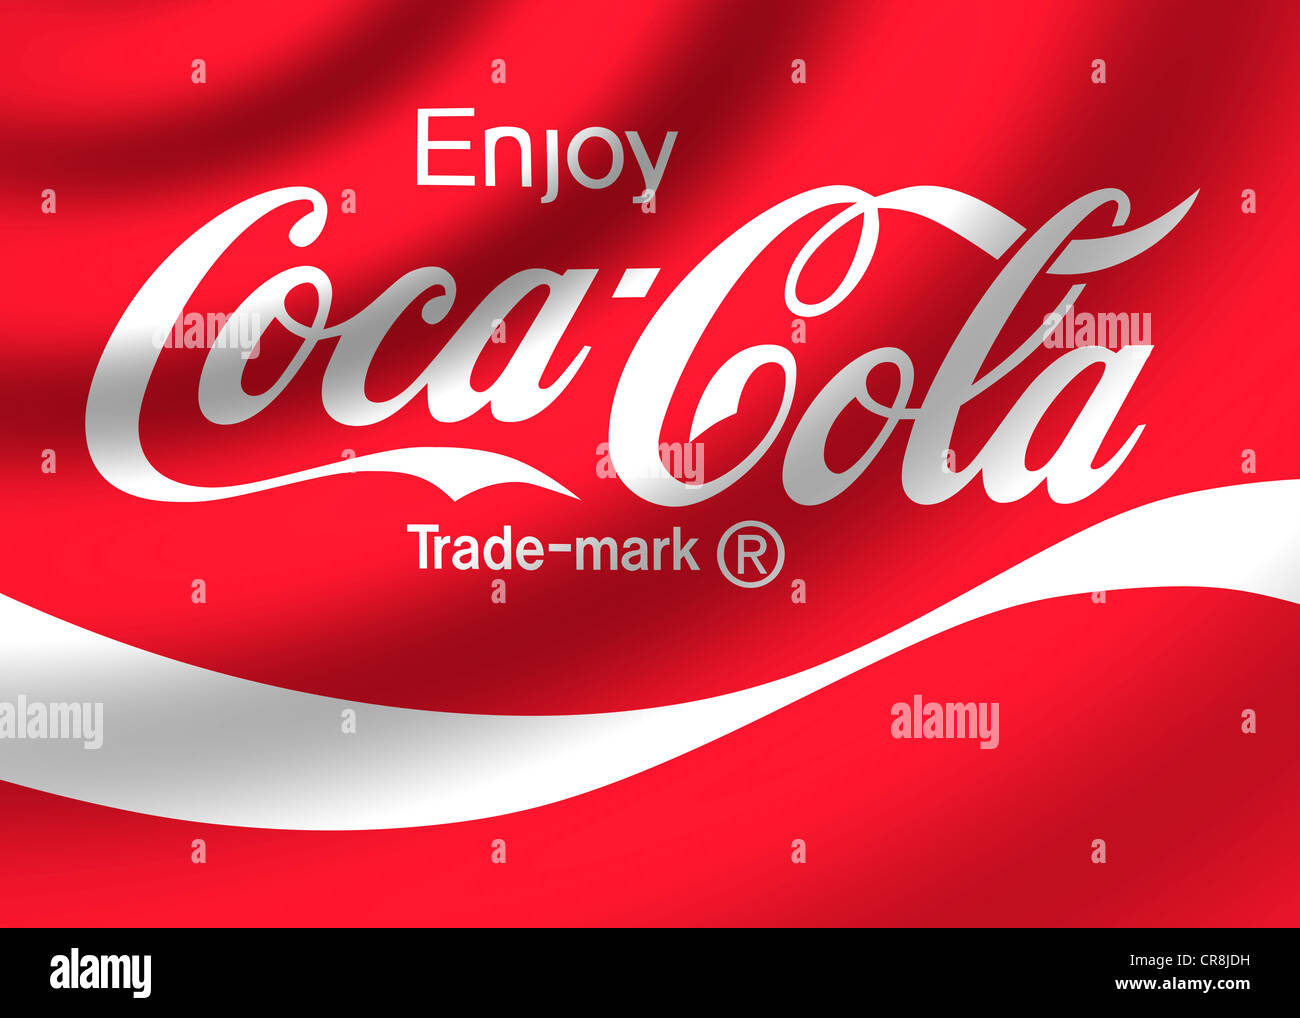 coca cola logo flag symbol stock photo royalty free image